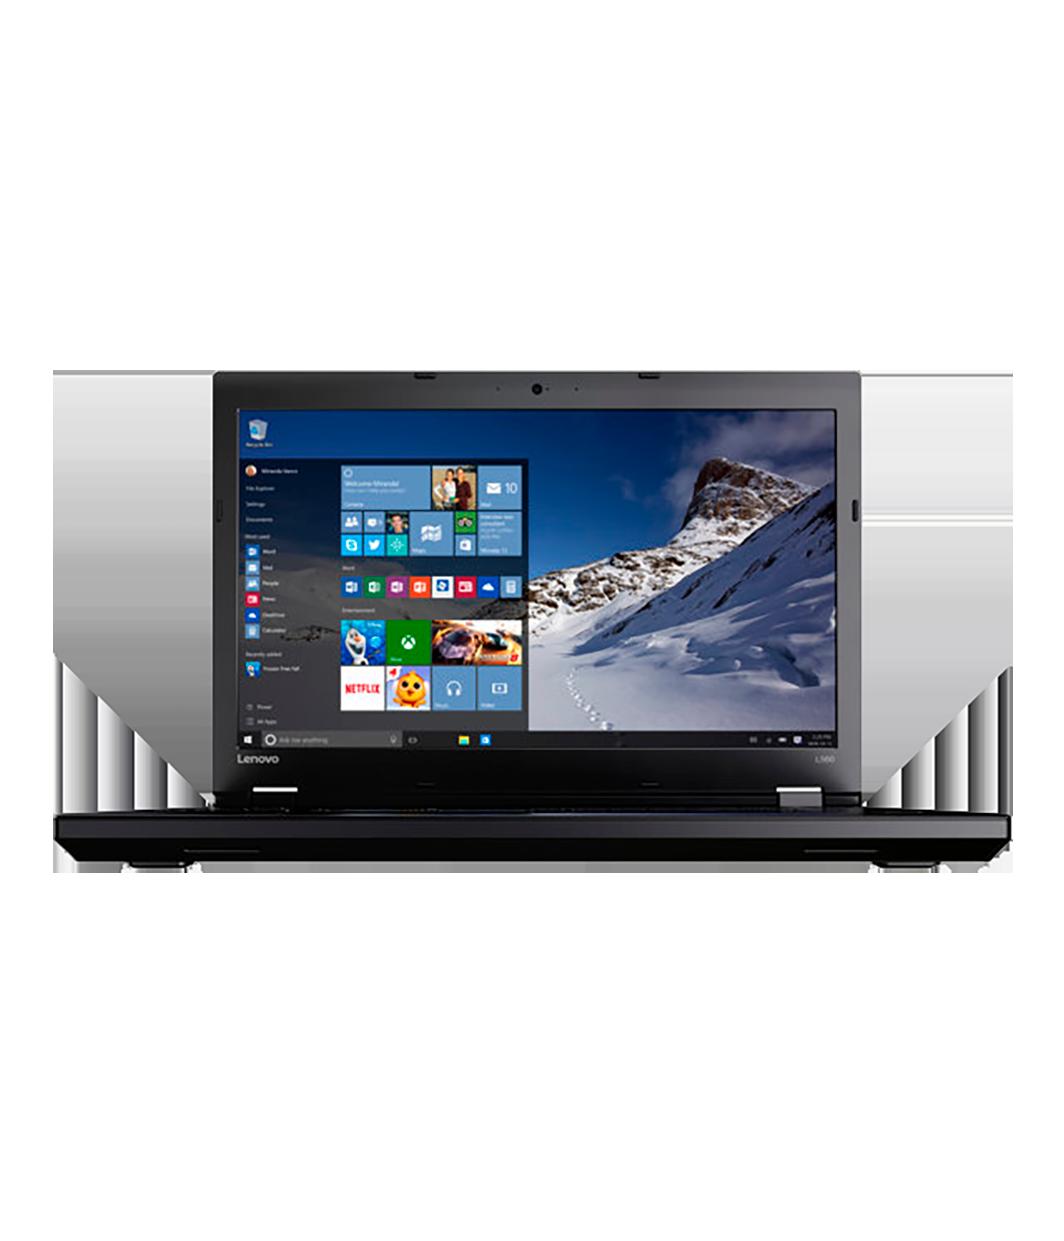 Lenovo ThinkPad L560 15 i7-6600U